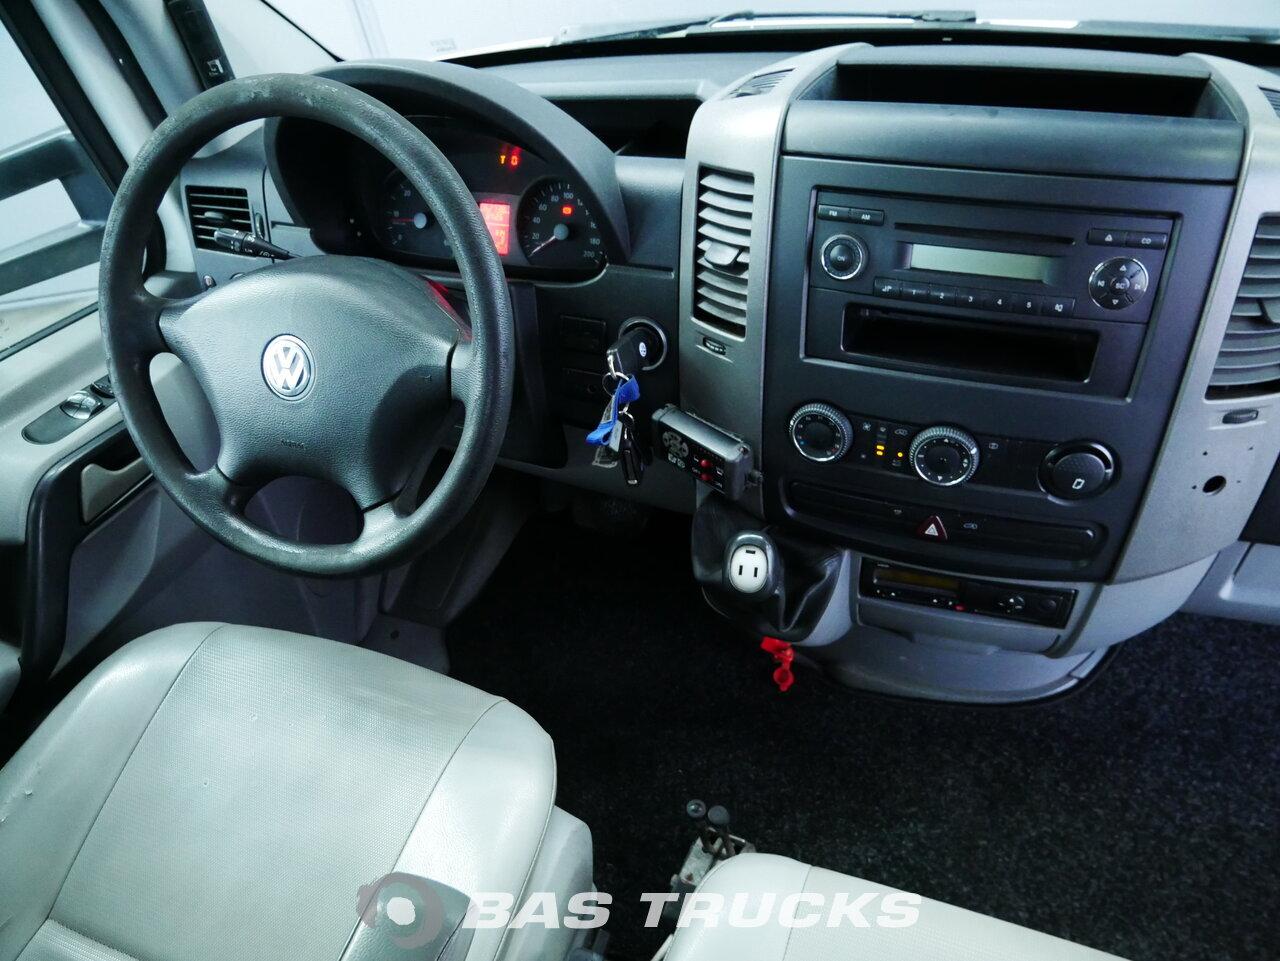 foto de Usado Furgoneta liviana Volkswagen Crafter 2009